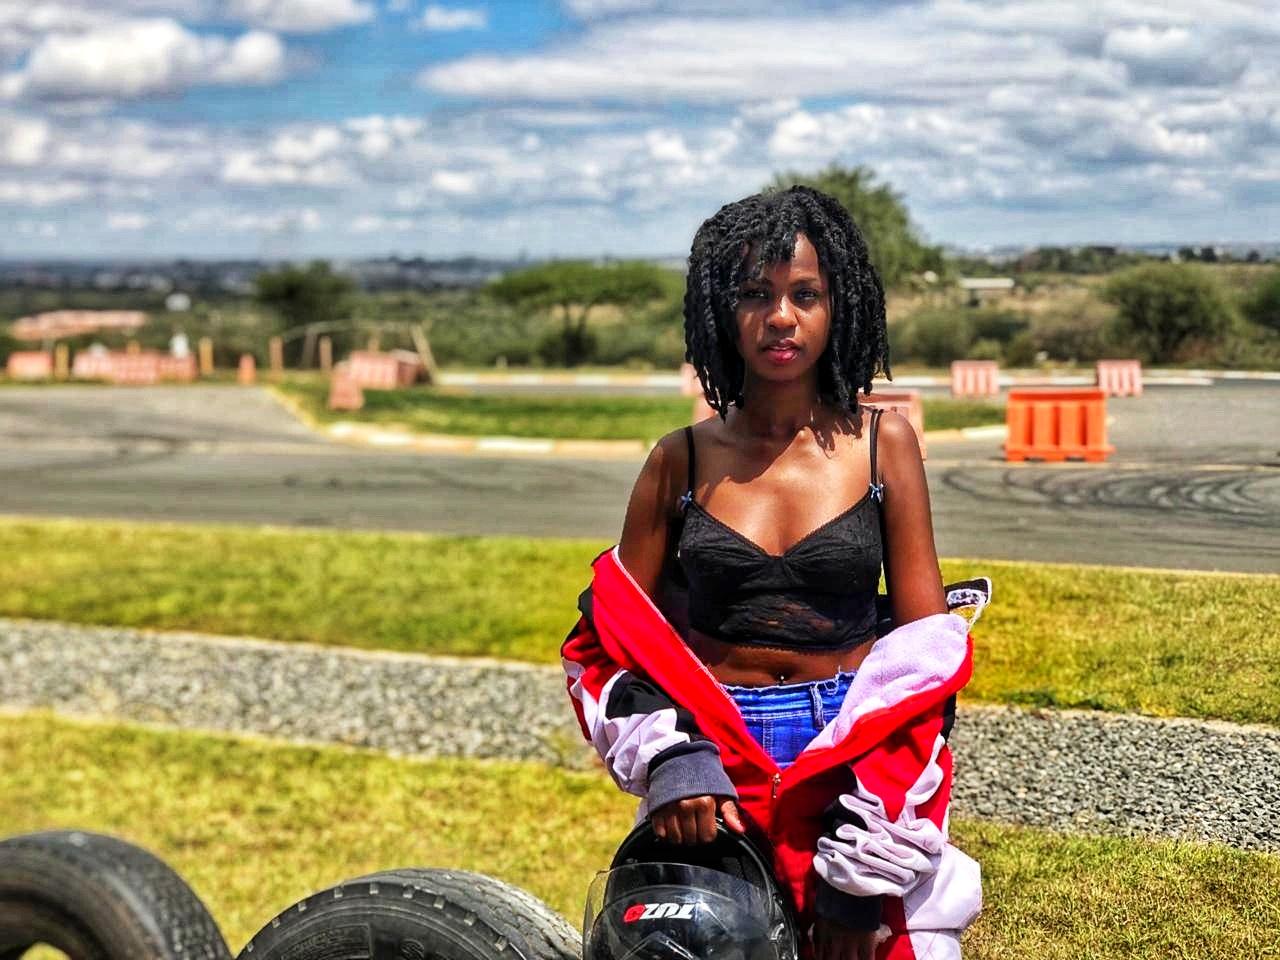 Cool and Fun things to do in Nairobi: GP Karting at Whistling Moran